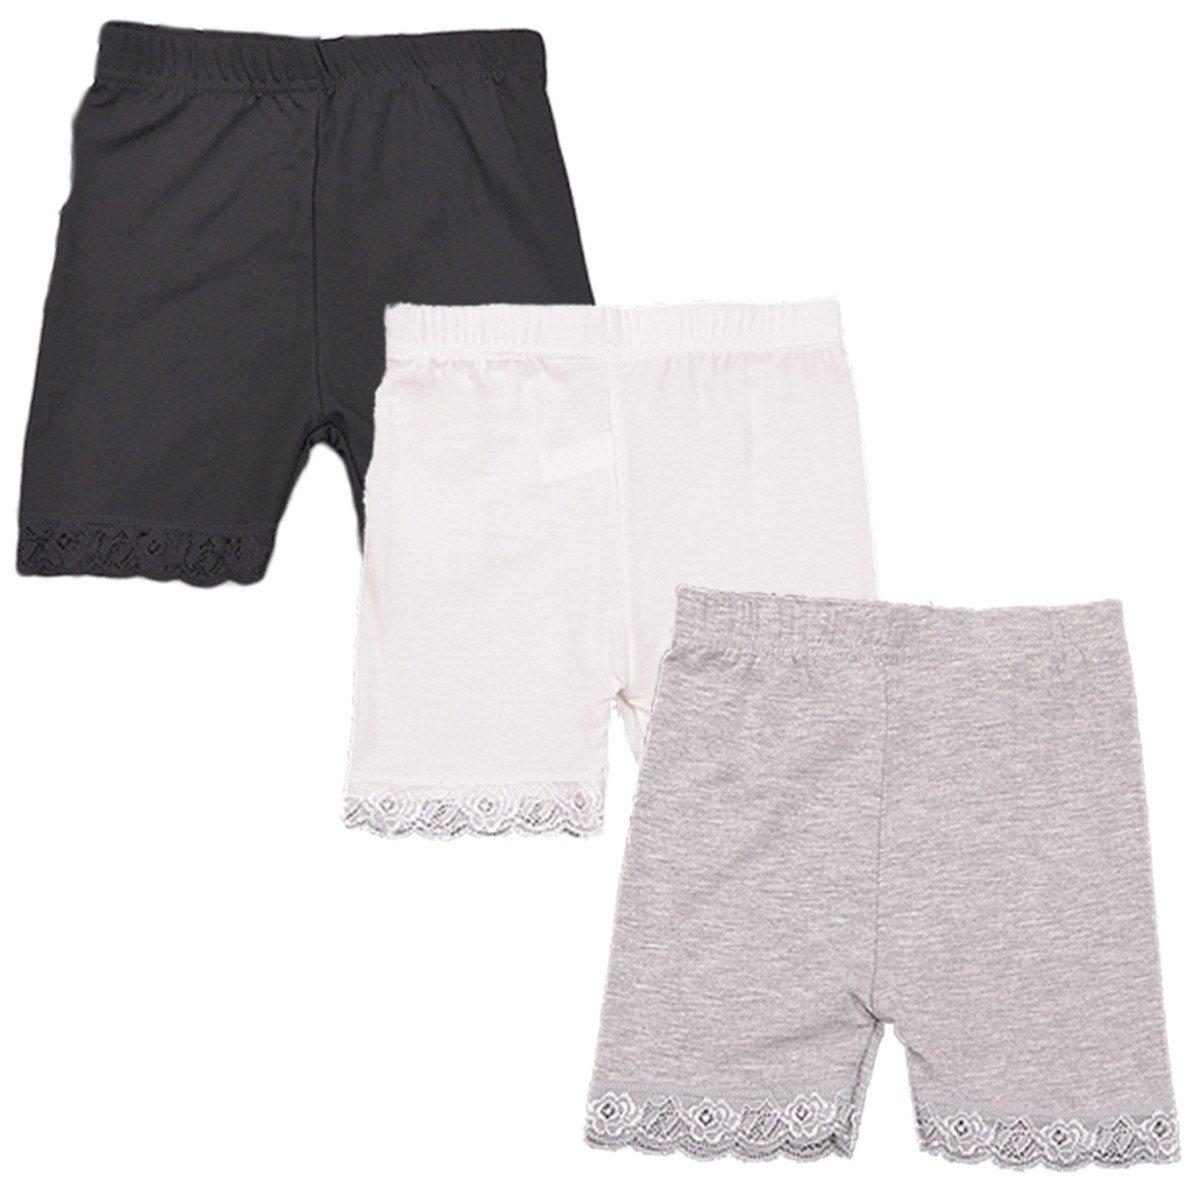 JELEUON 3 Pcs Little Girls Kids Boy-Leg Slim Elastic Safety Short Lace Trim Panties Dancewear 4-5 Y